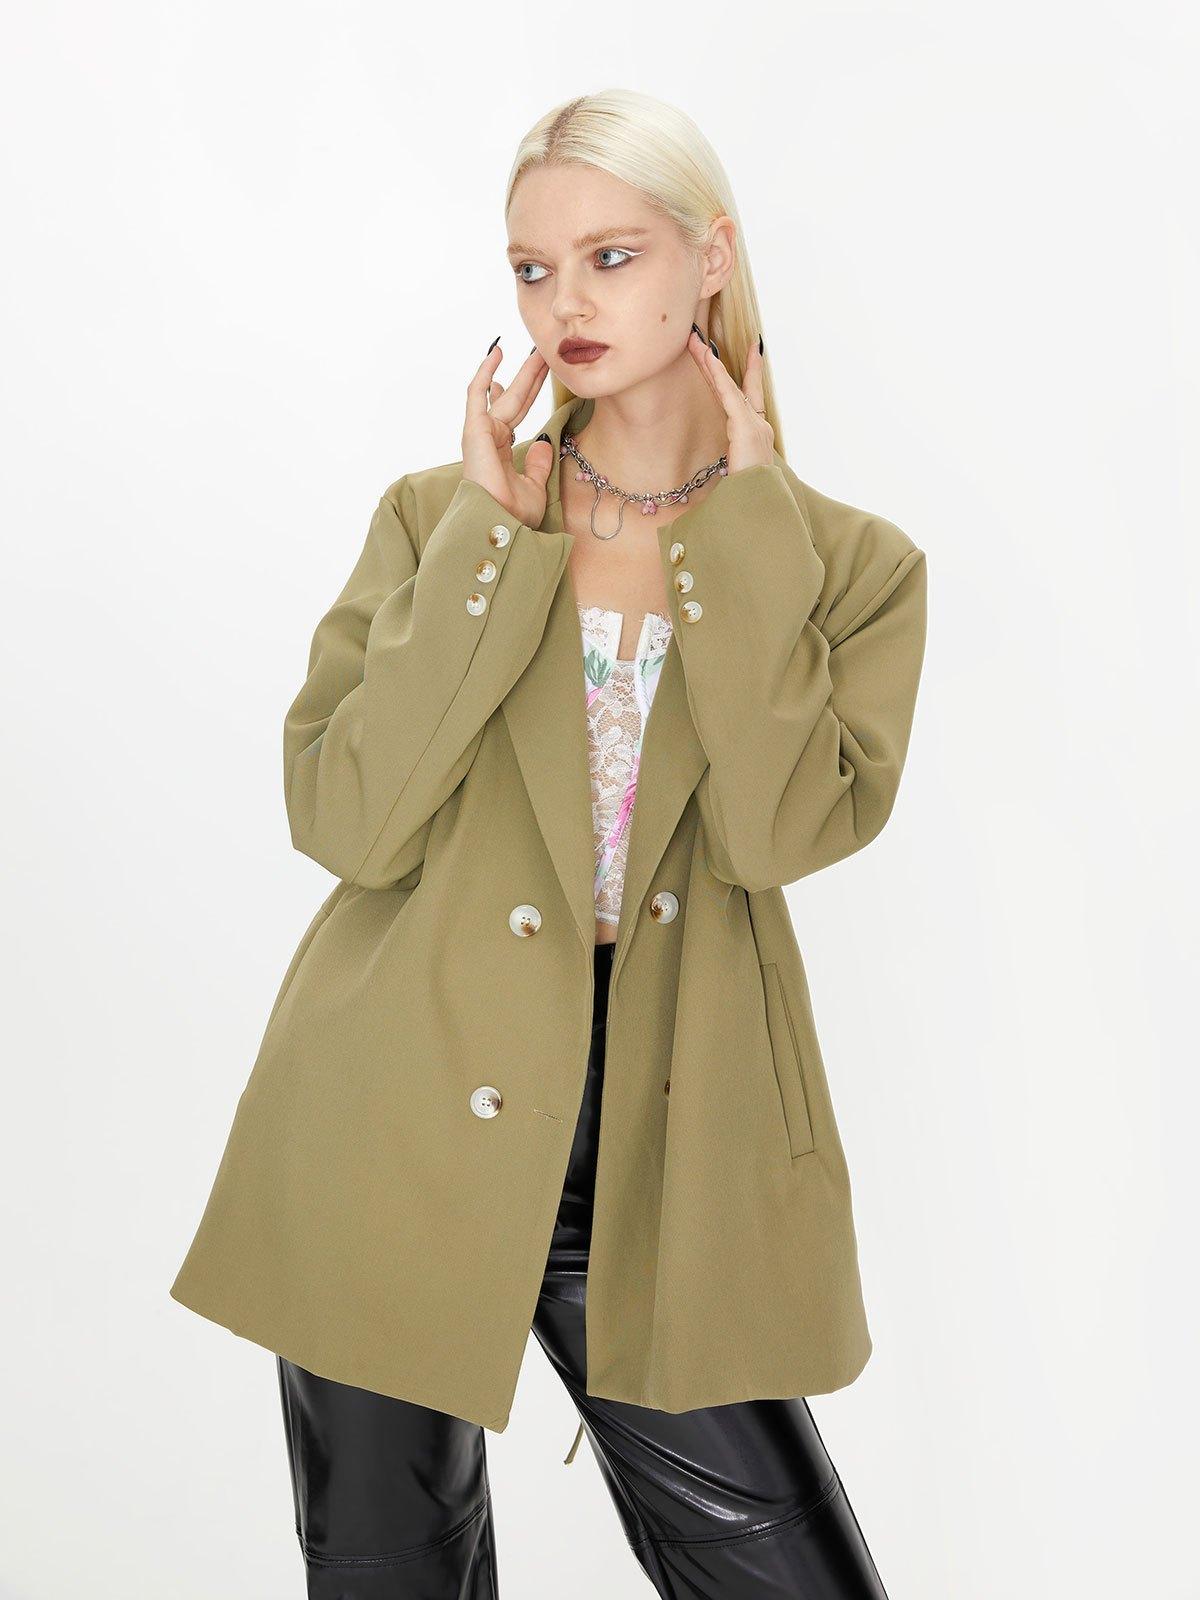 Cutout Lace Up Blazer - Green S